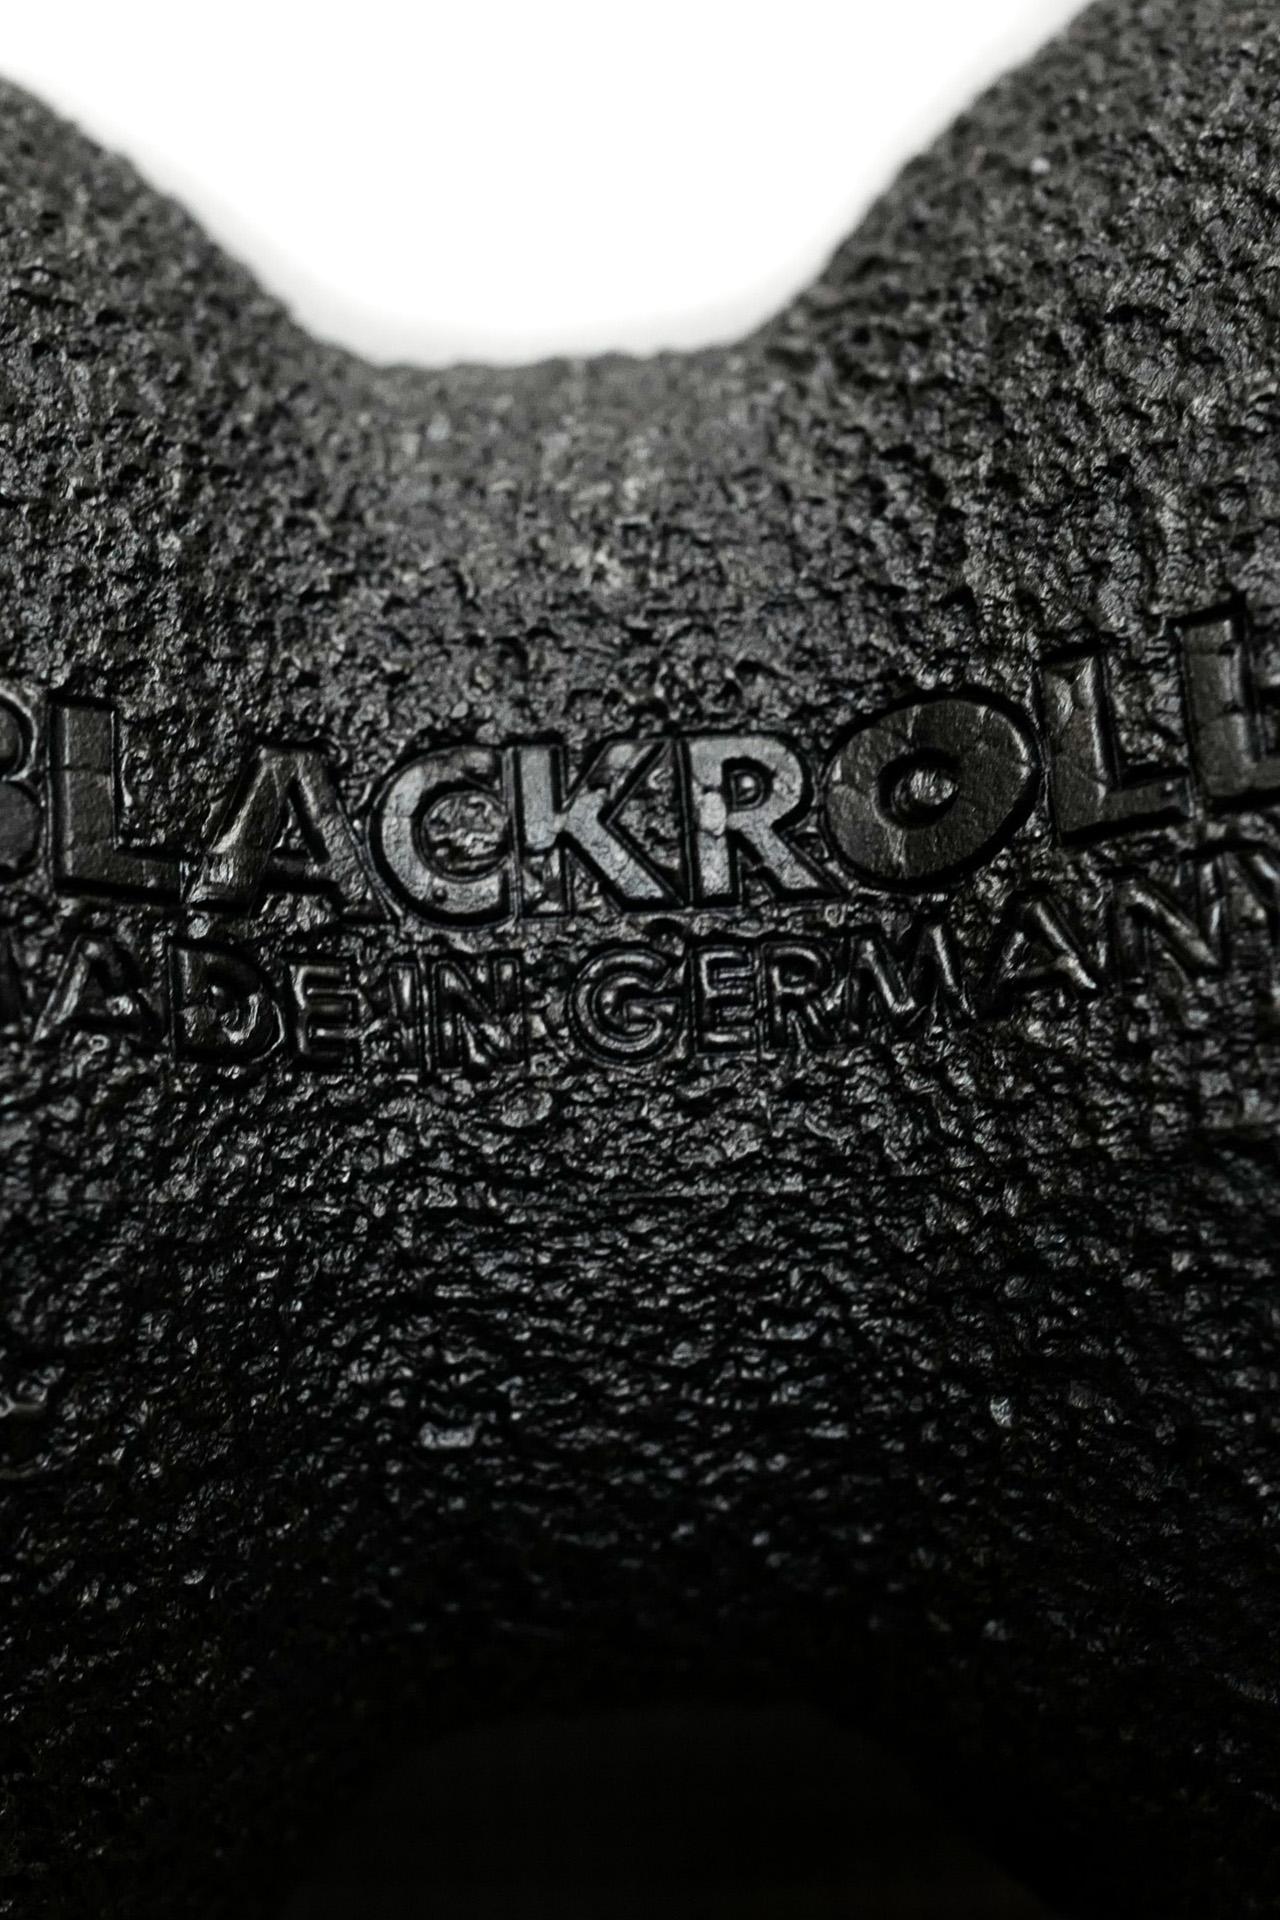 blackroll duoball 12cm fengbao kung fu shop wien 1080 textur close up